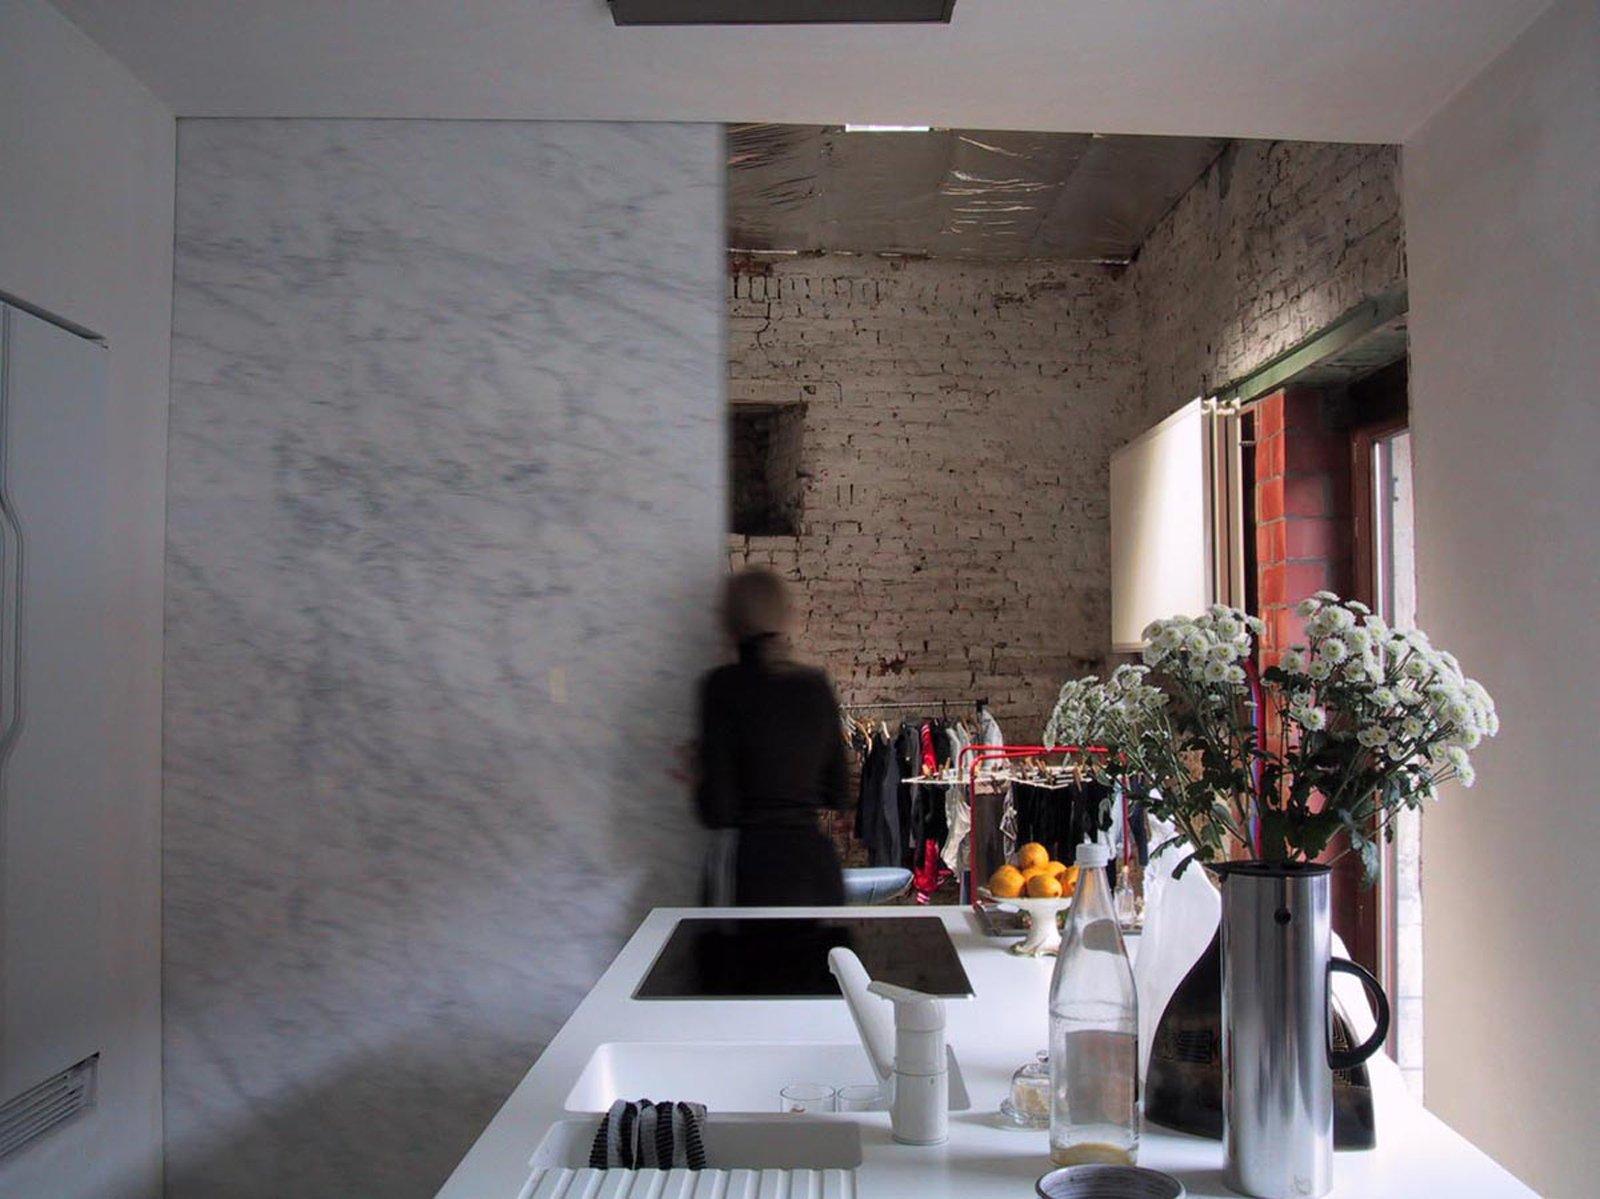 Photo 3 of 5 in Flemish Farmhouse Kitchen